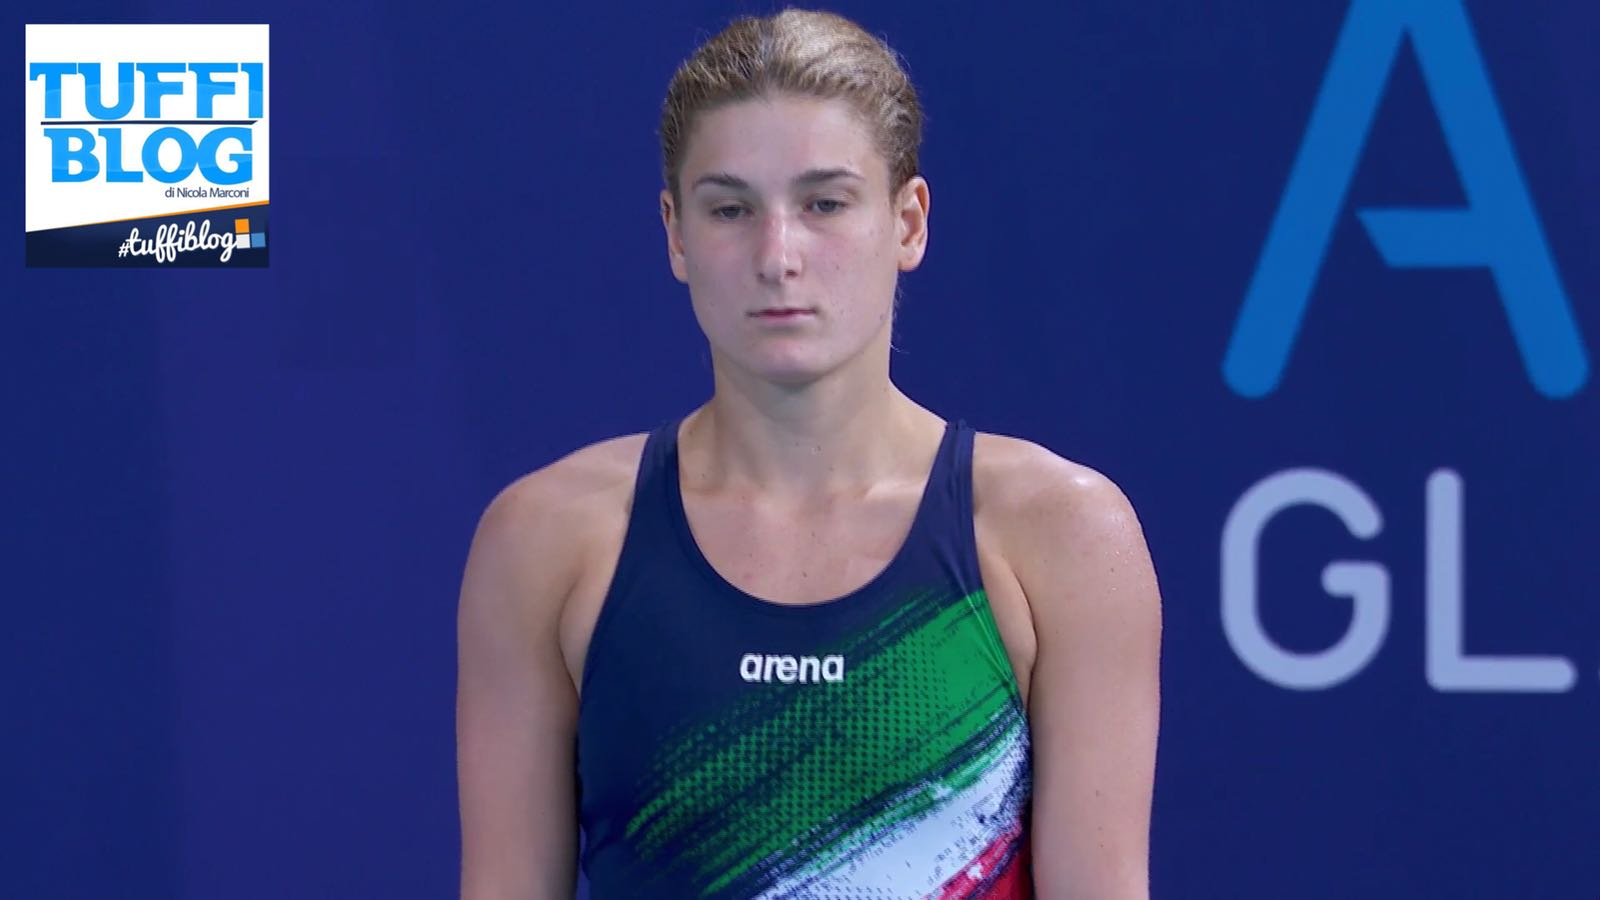 European Championships: Edimburgo - bene Pellacani, Bertocchi soffre, ma due italiane in finale!